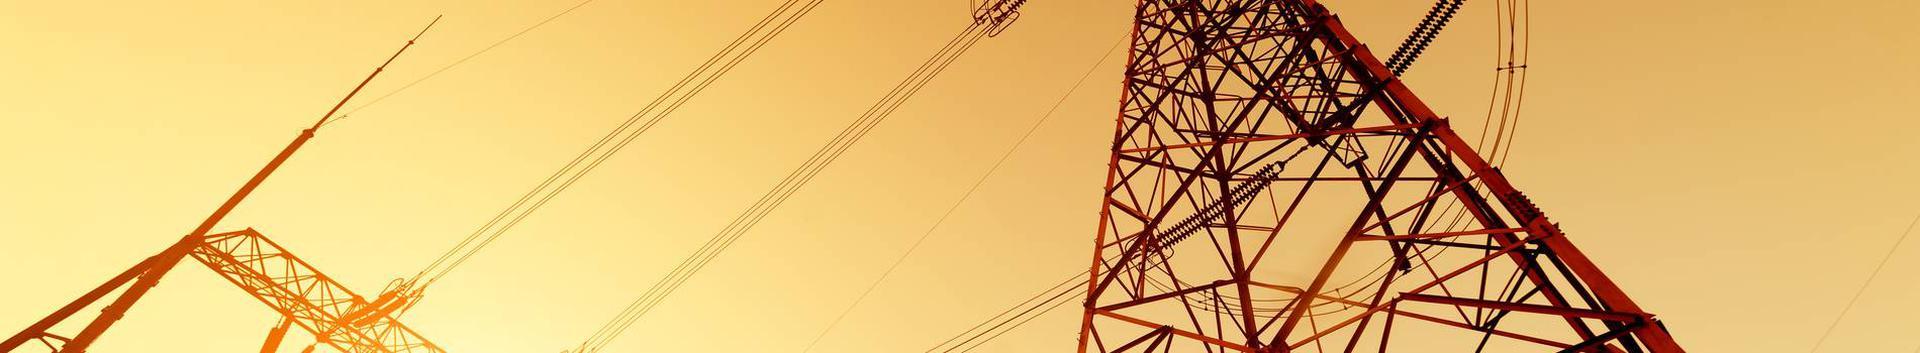 3511_elektrienergia-tootmine_15432546_xl.jpg